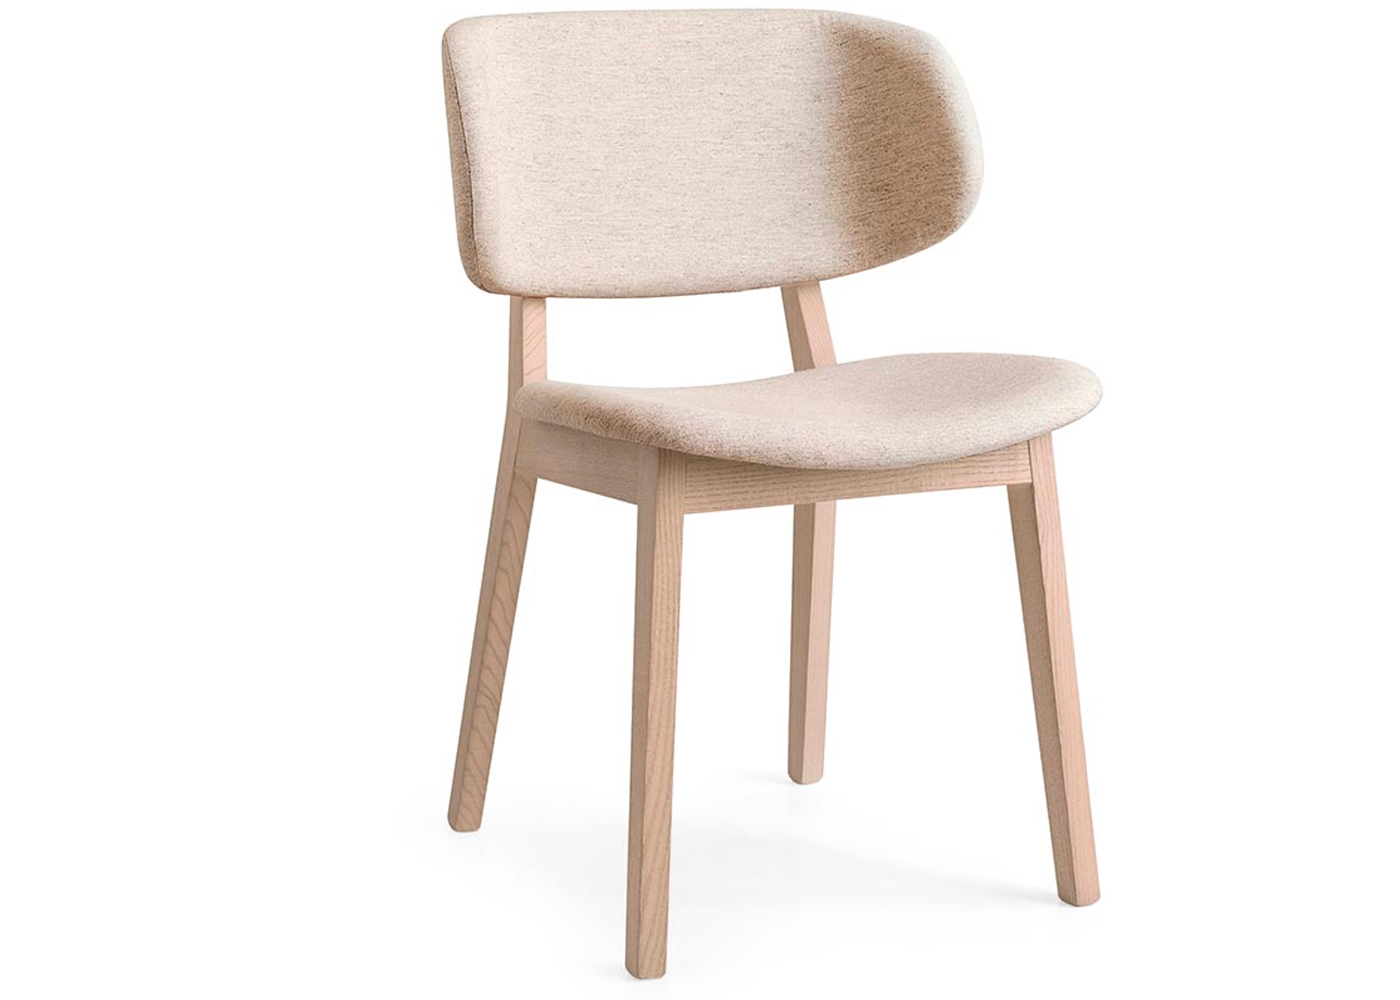 calligaris sofas uk sofa set designs photos hot claire chair midfurn furniture superstore